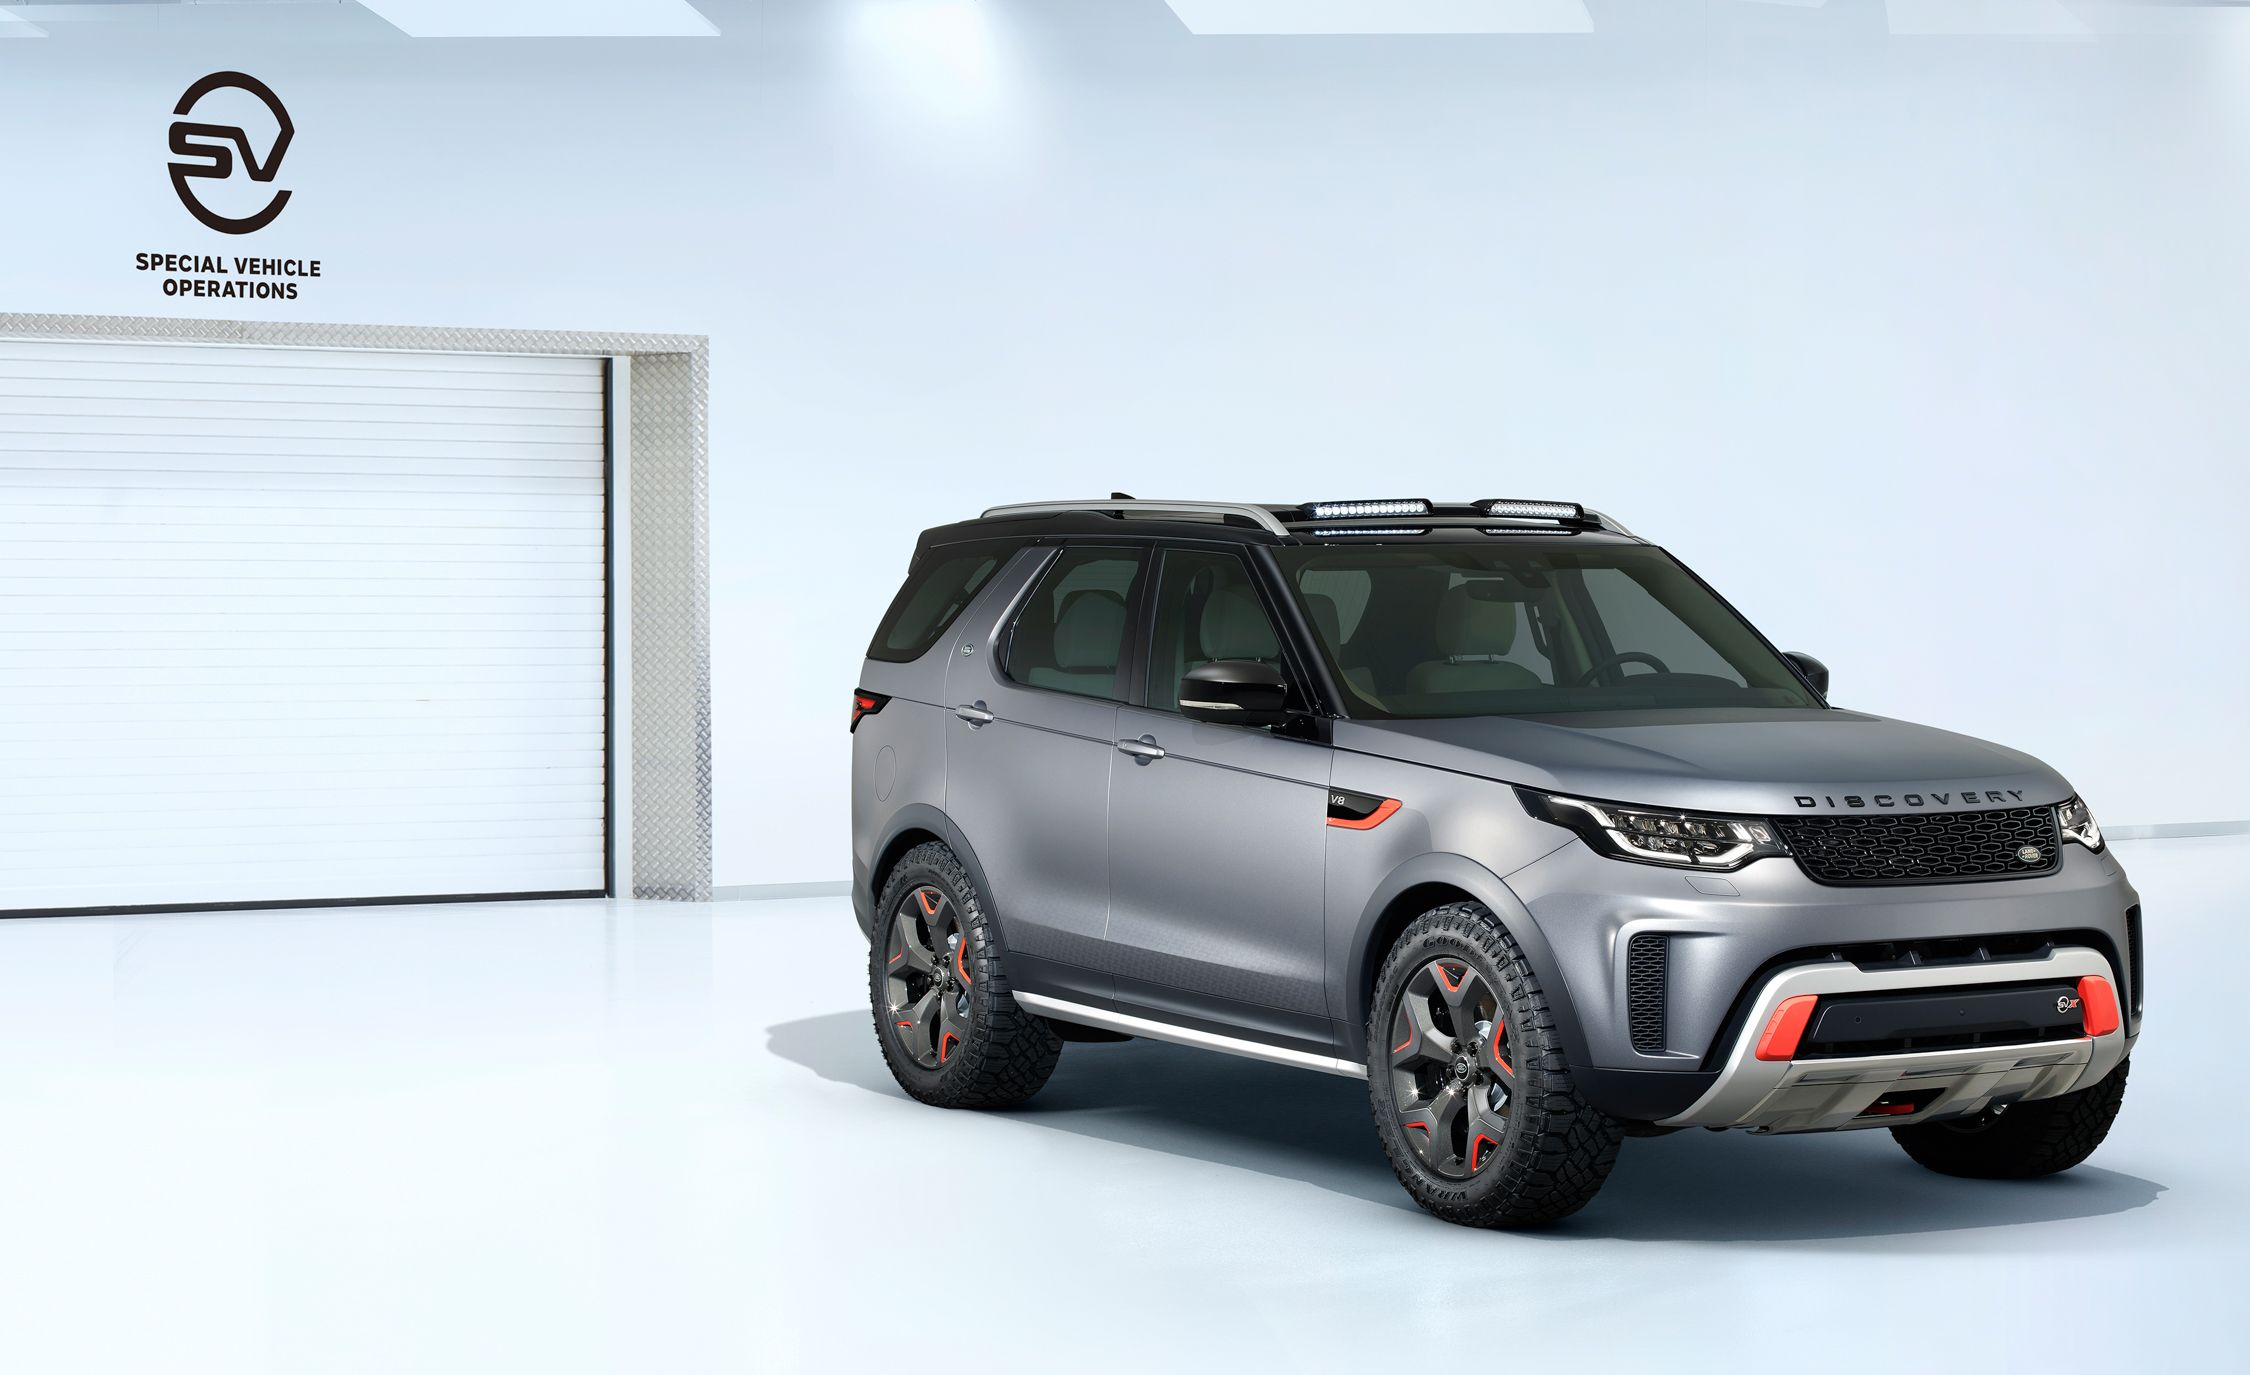 Land Rover Discovery Svx Reviews Land Rover Discovery Svx Price